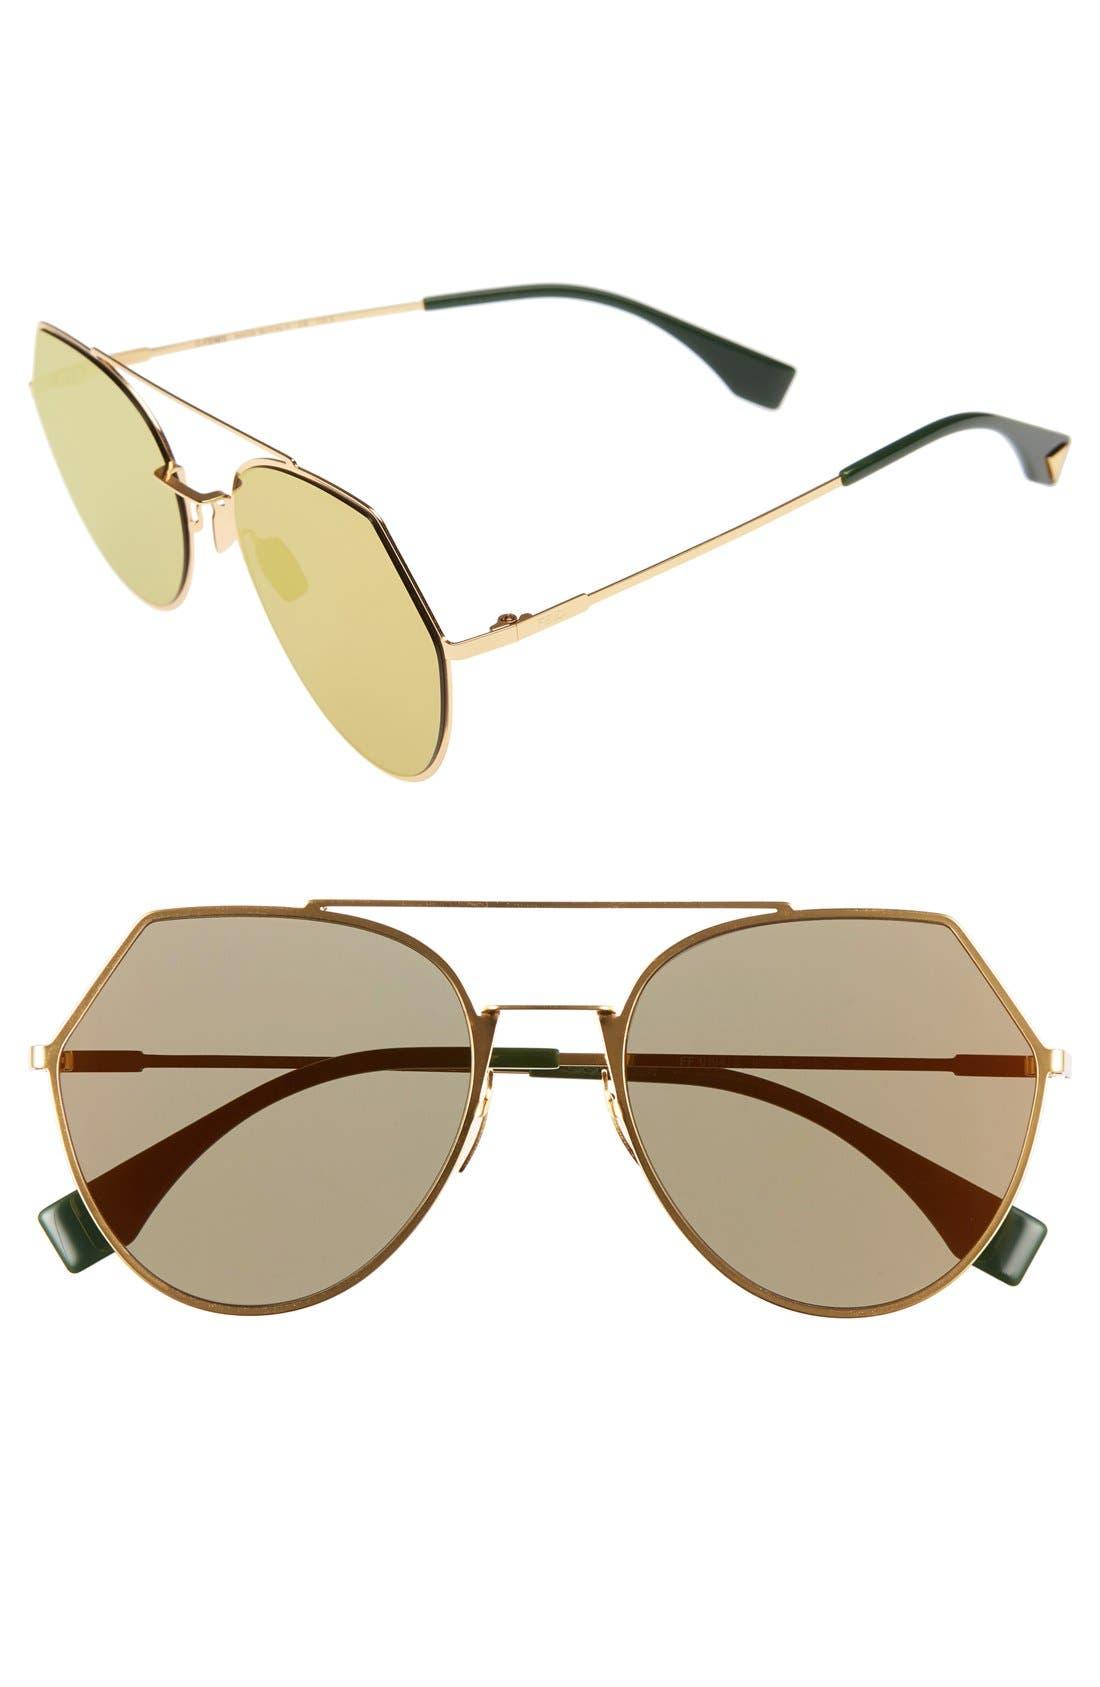 Eyeline 55mm Sunglasses,                         Main,                         color, Yellow Gold